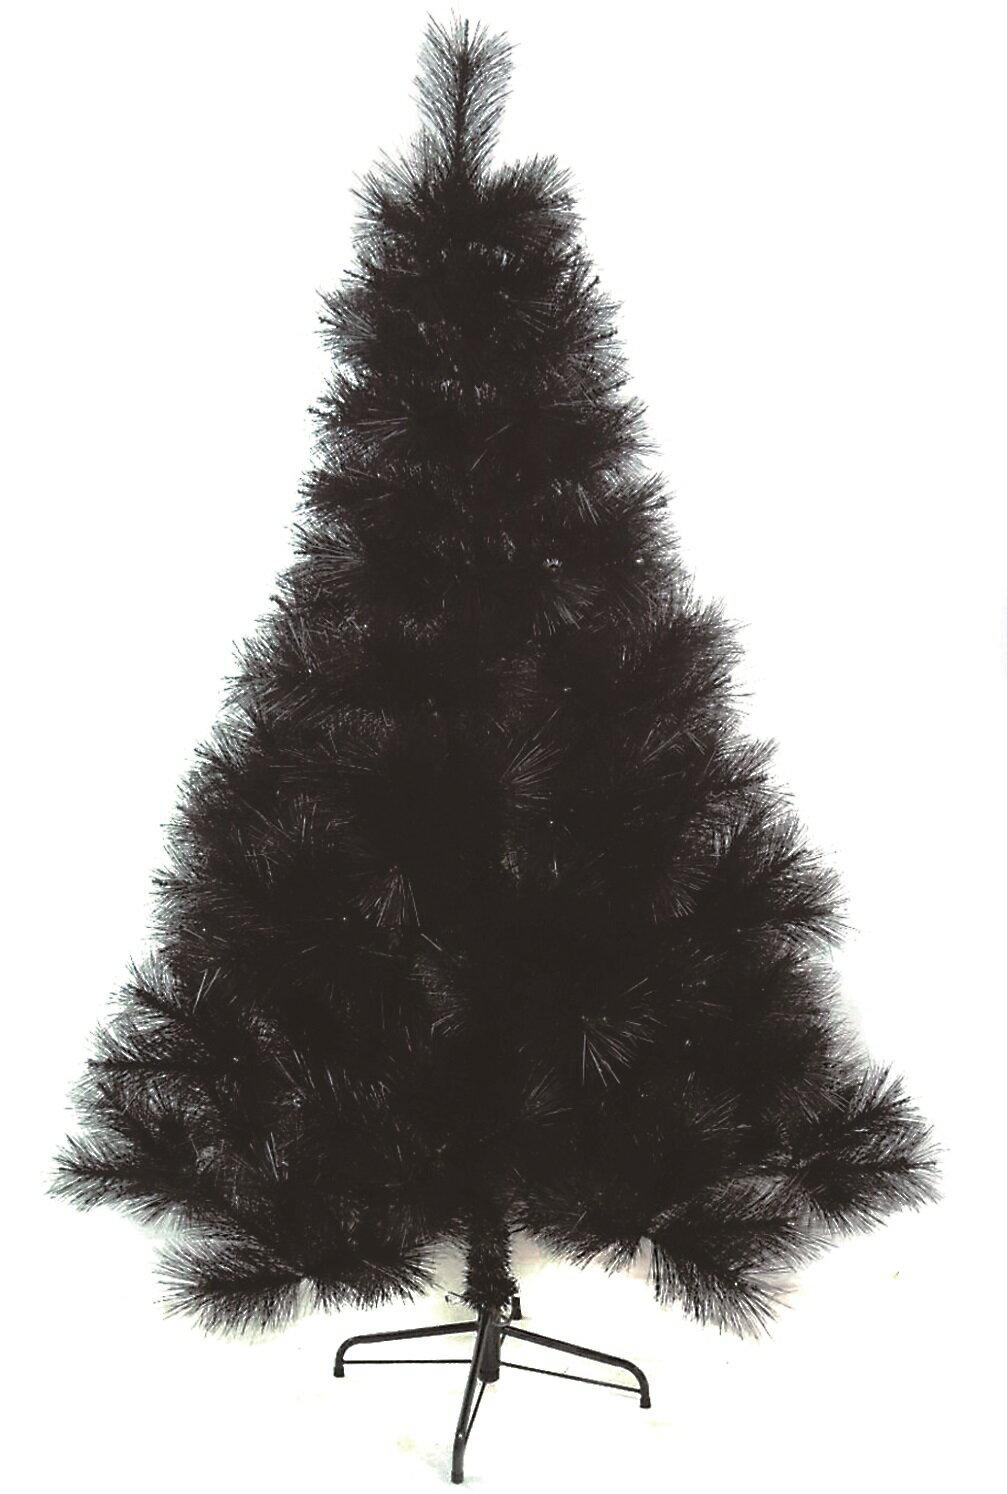 <br/><br/>  X射線【X023056】6尺聖誕松針樹(黑)(不含飾品、燈飾),聖誕樹/聖誕佈置/聖誕空樹/聖誕造景<br/><br/>